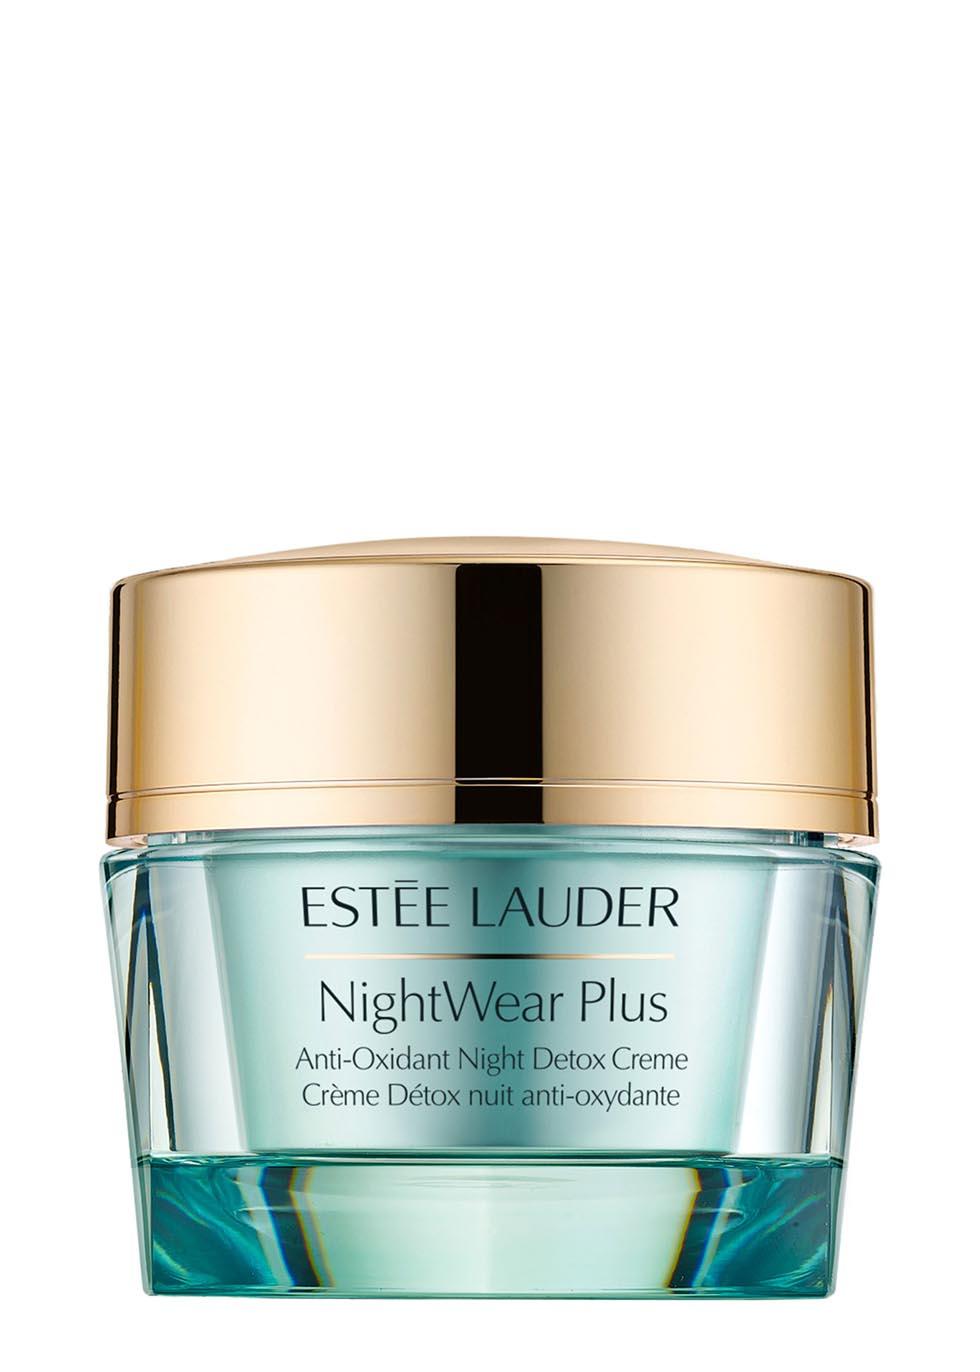 NightWear Plus Anti-Oxidant Detox Crème 50ml